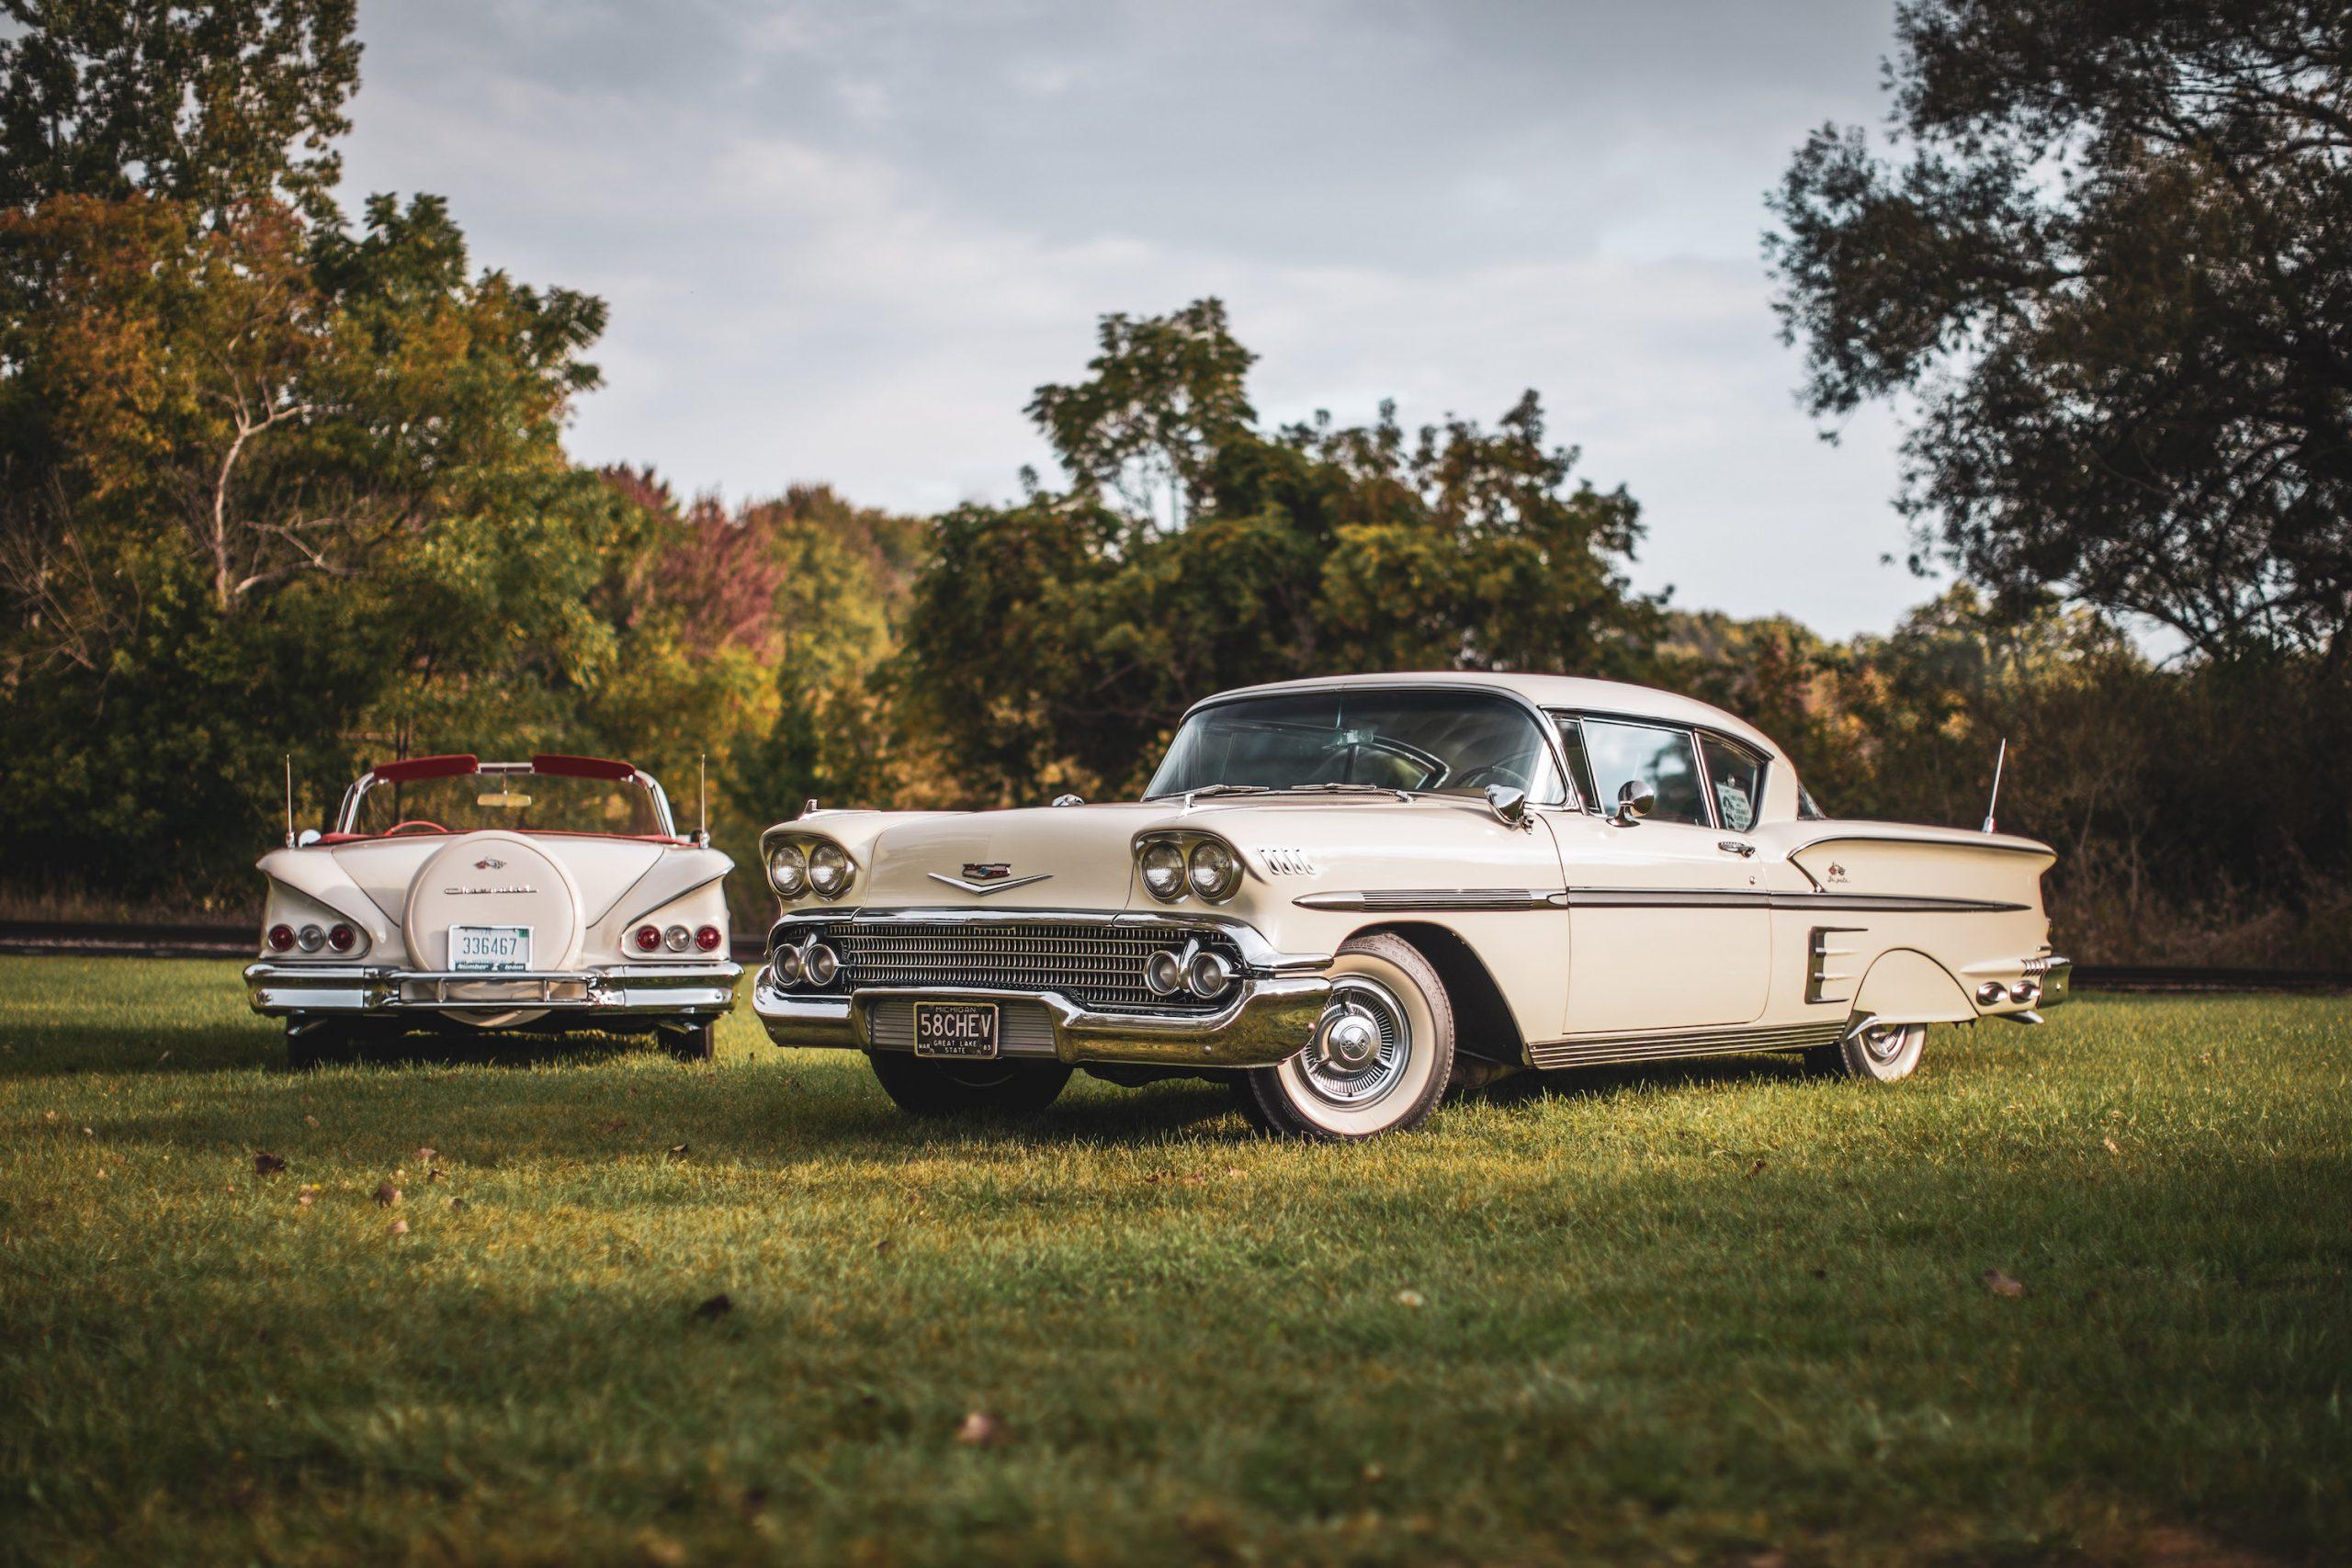 1958 Chevrolet Impalas